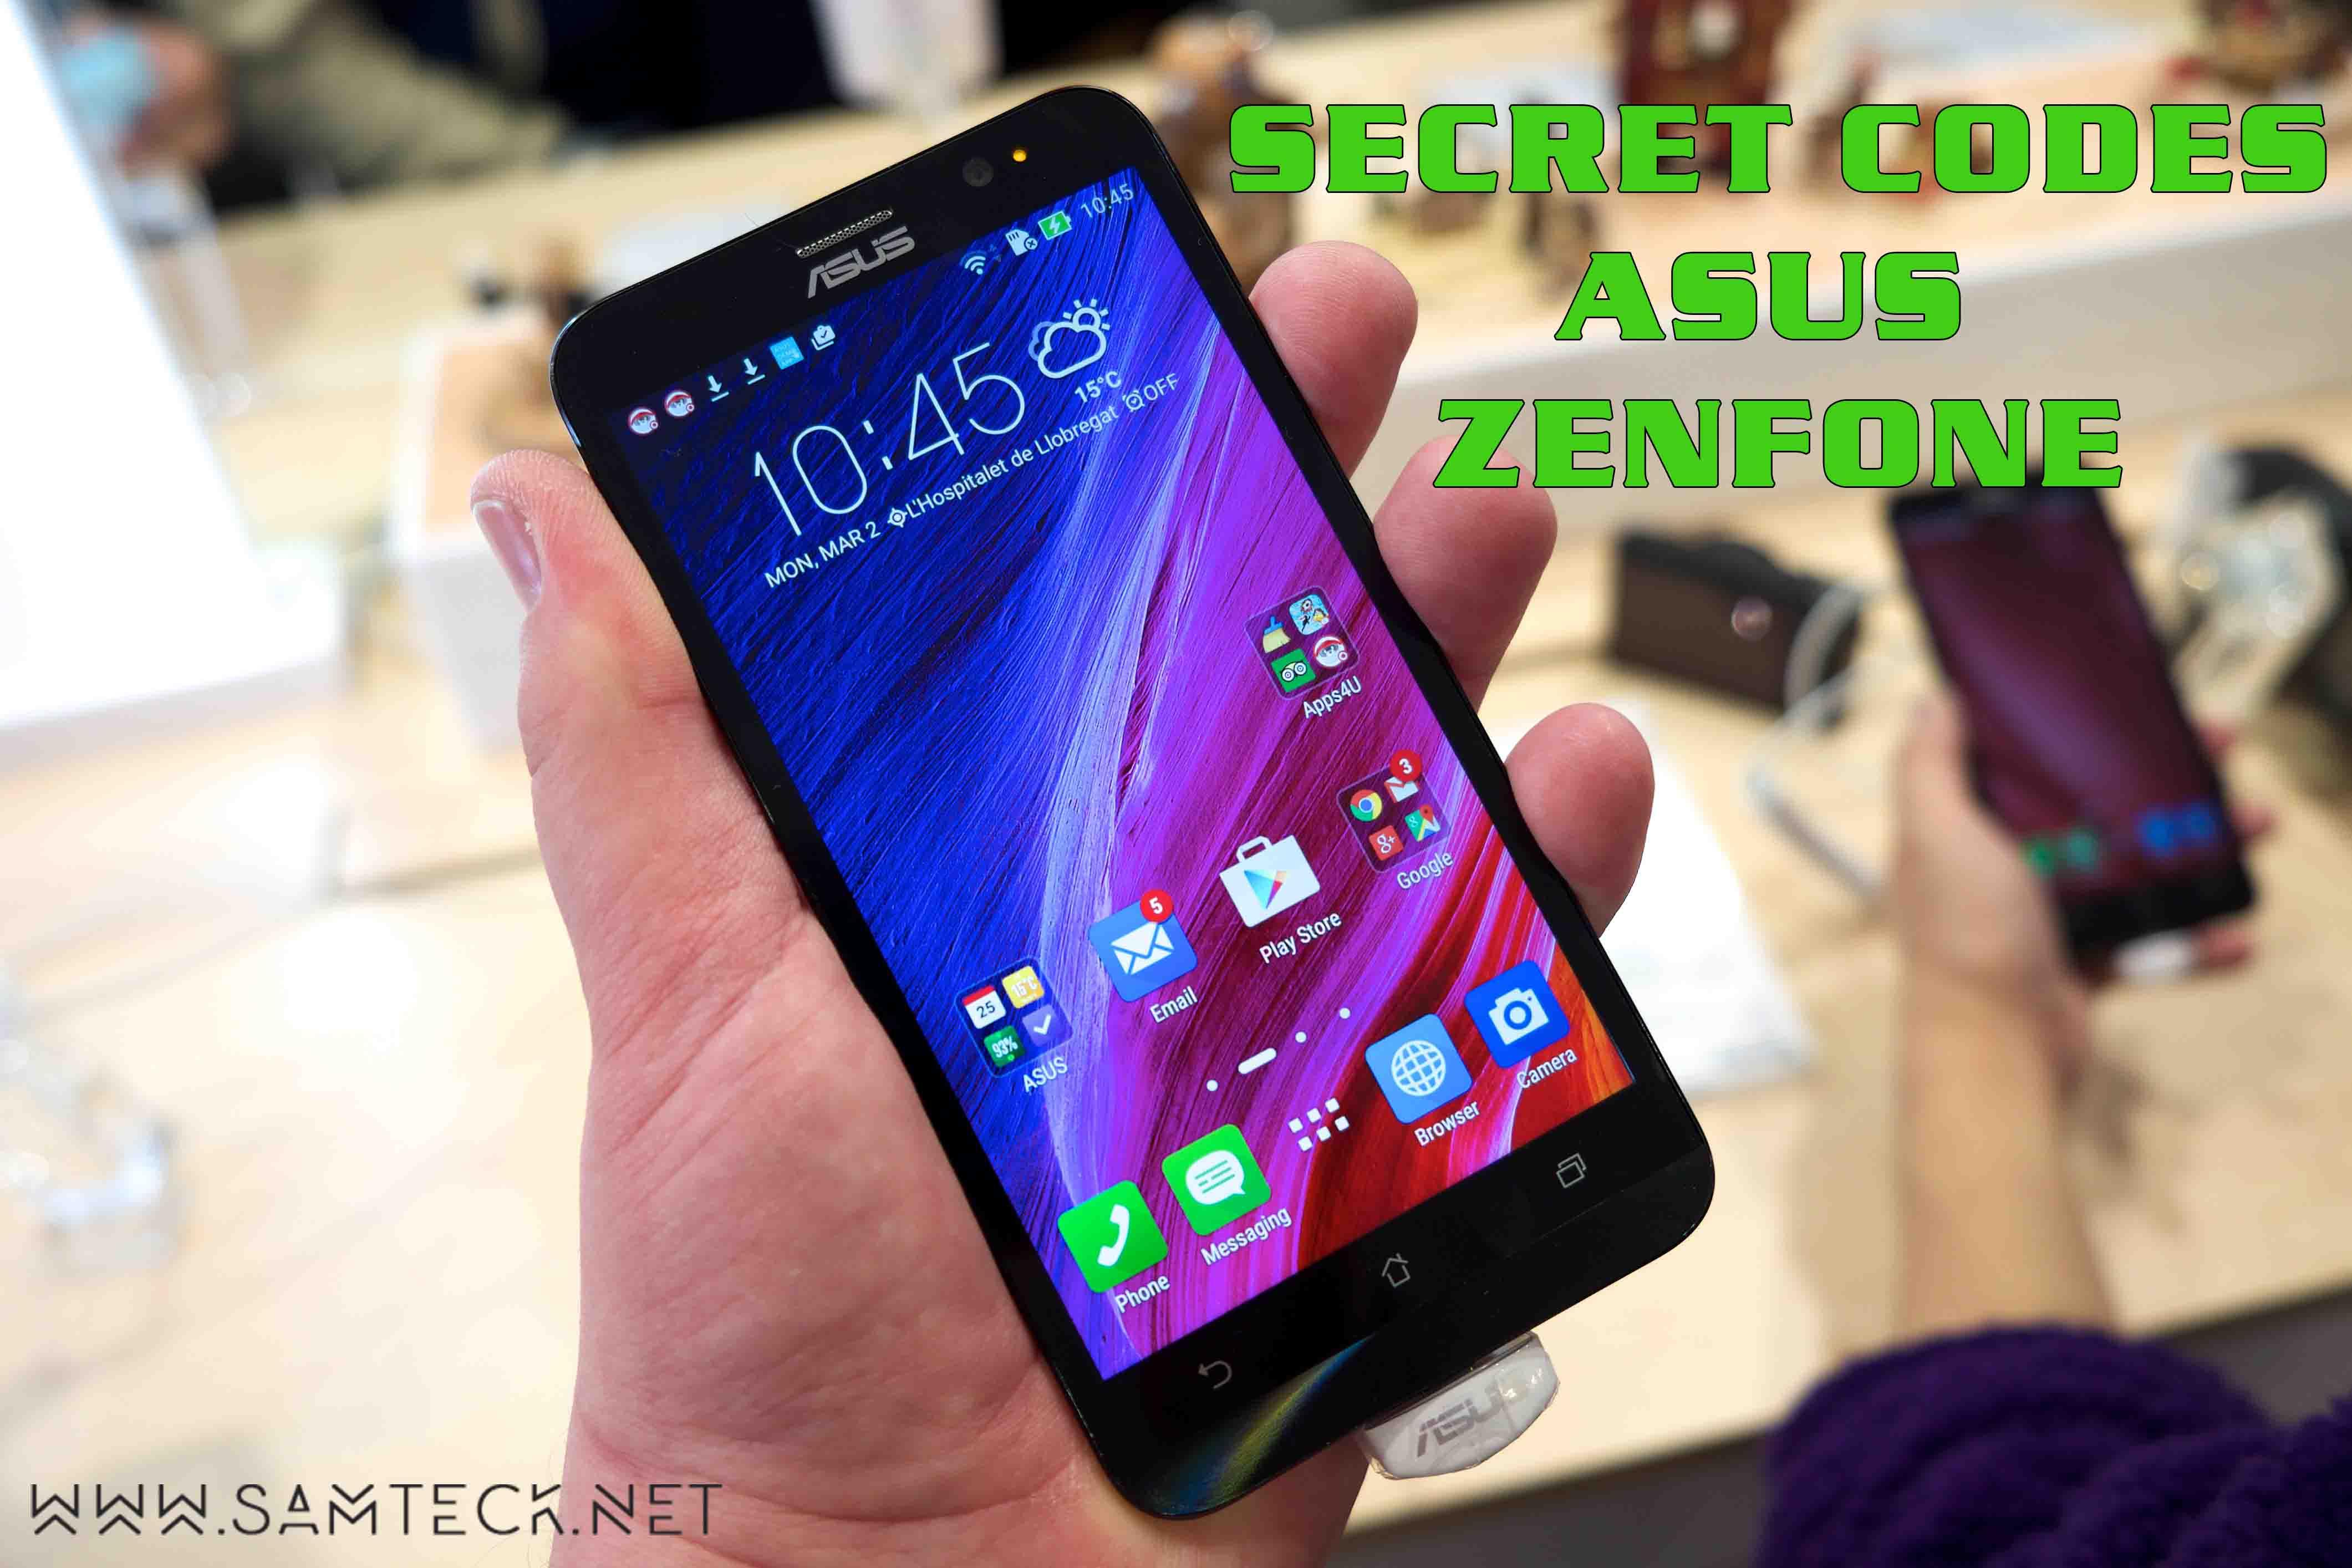 Asus Zenfone 2 Secret Codes and Accessing Hidden Menu